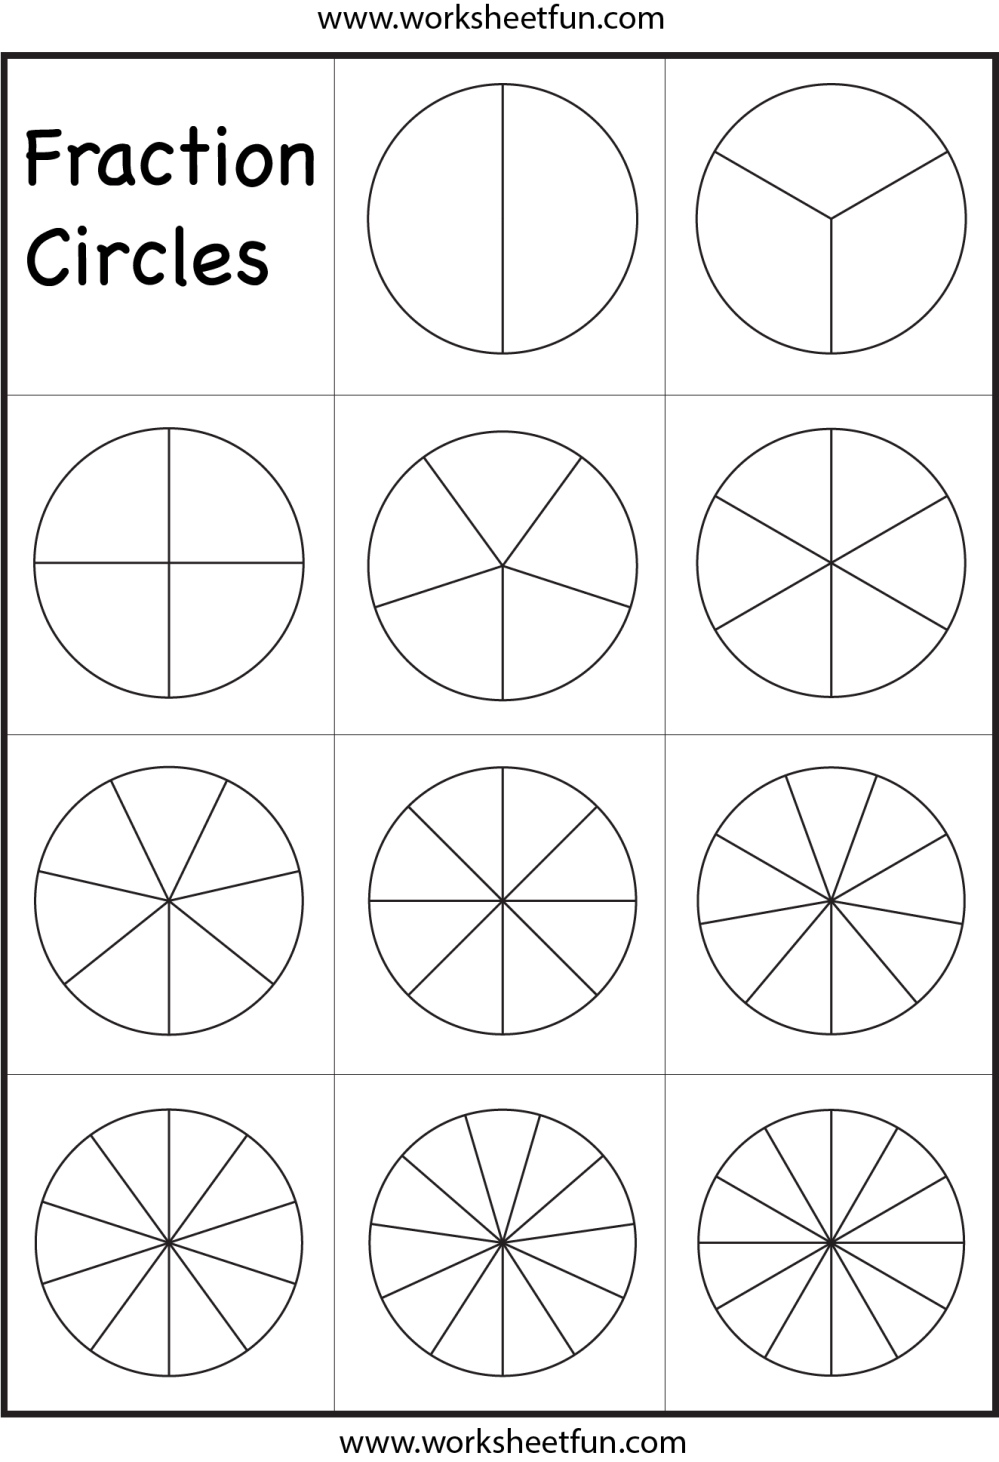 medium resolution of Fraction Circles Template – Printable Fraction Circles – 1 Worksheet / FREE  Printable Worksheets – Worksheetfun